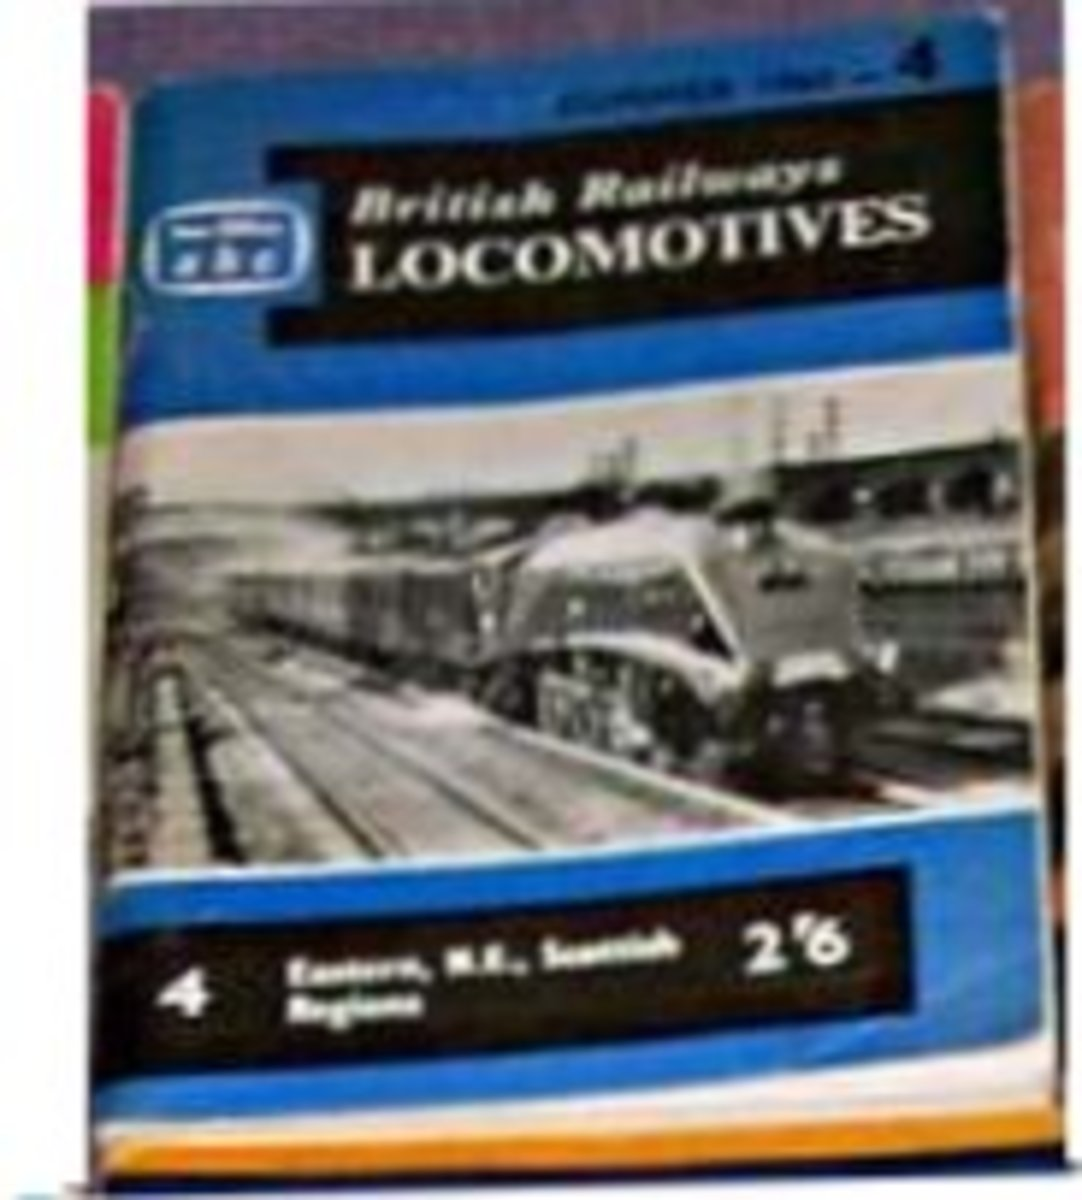 One of Ian Allan's ABC of British Railway Locomotives booklets